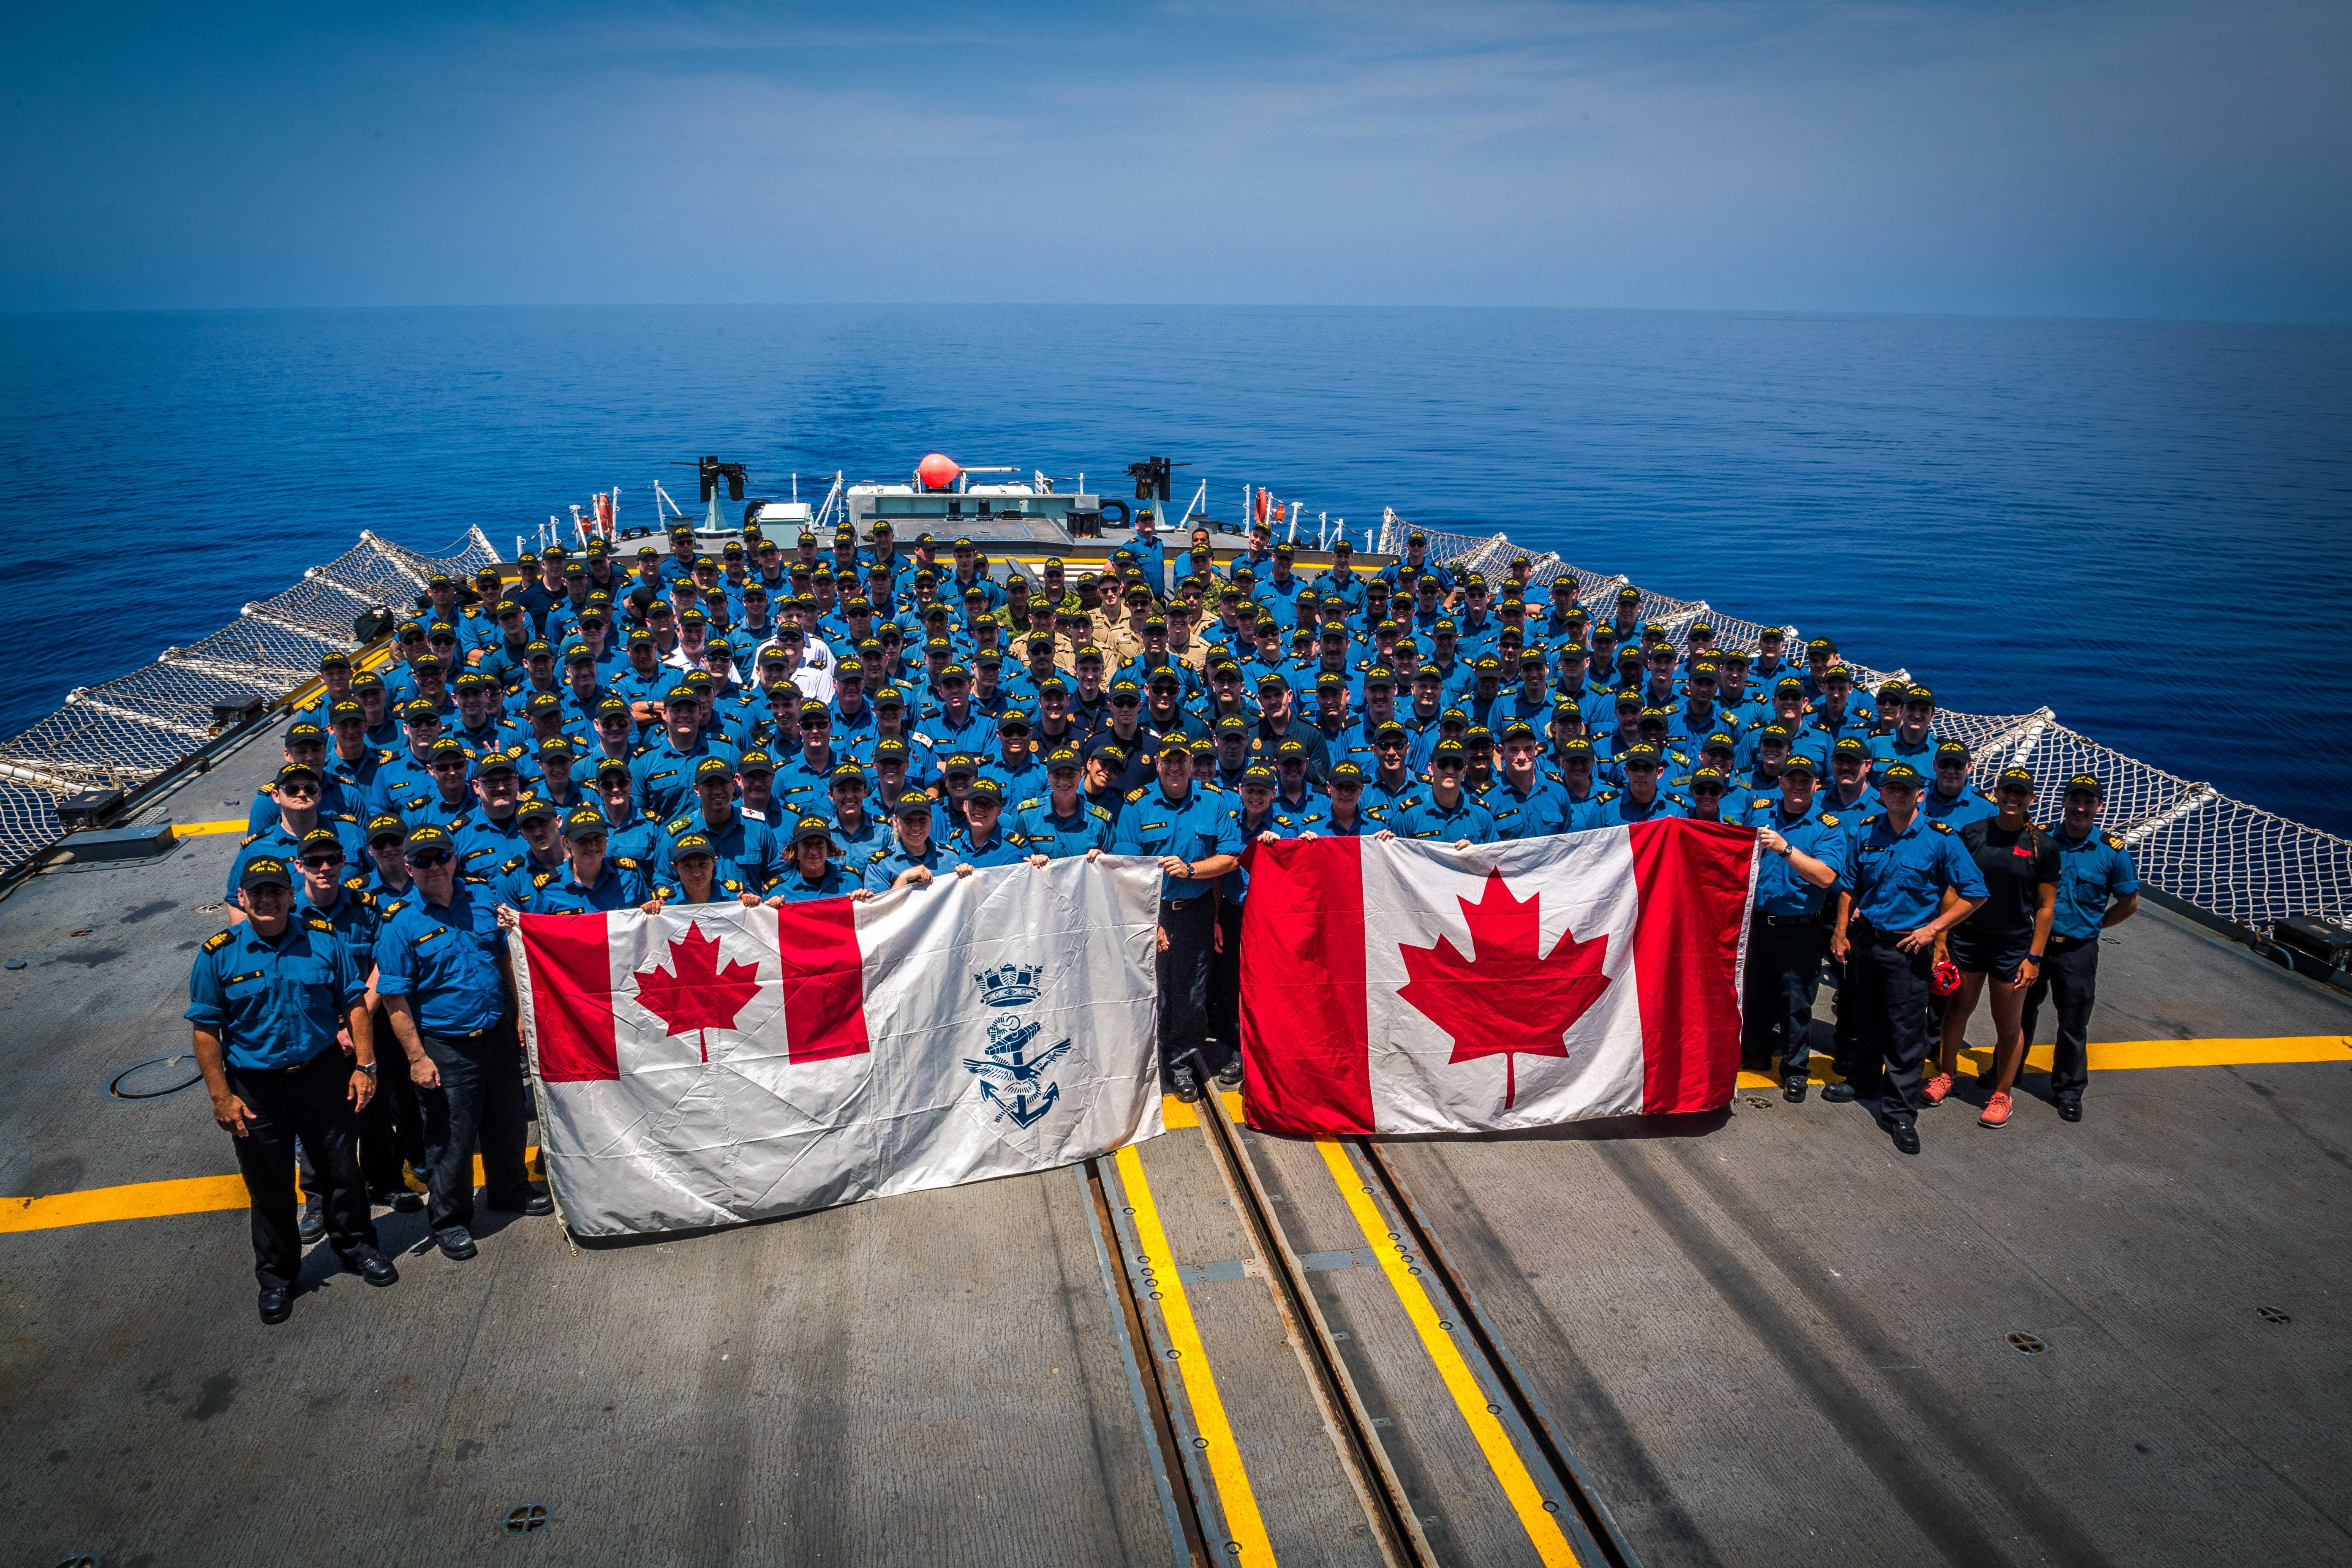 Happy Canada Day from HMCS St. John's